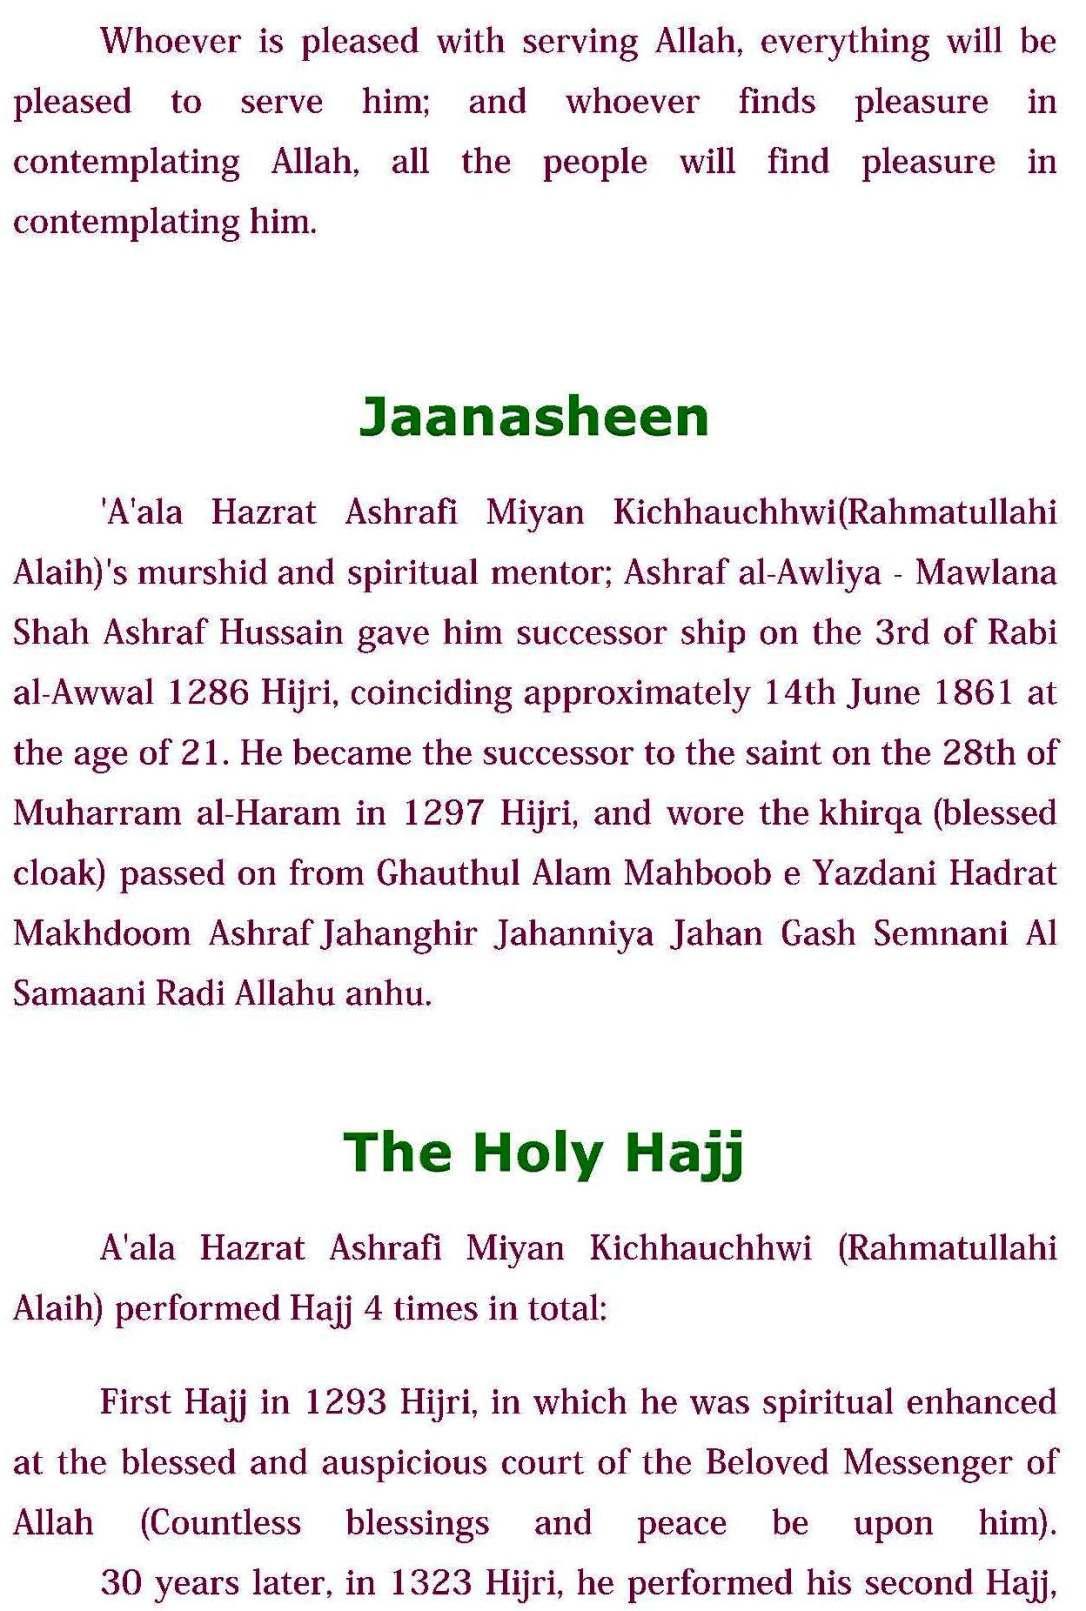 Aala Hazrat-10